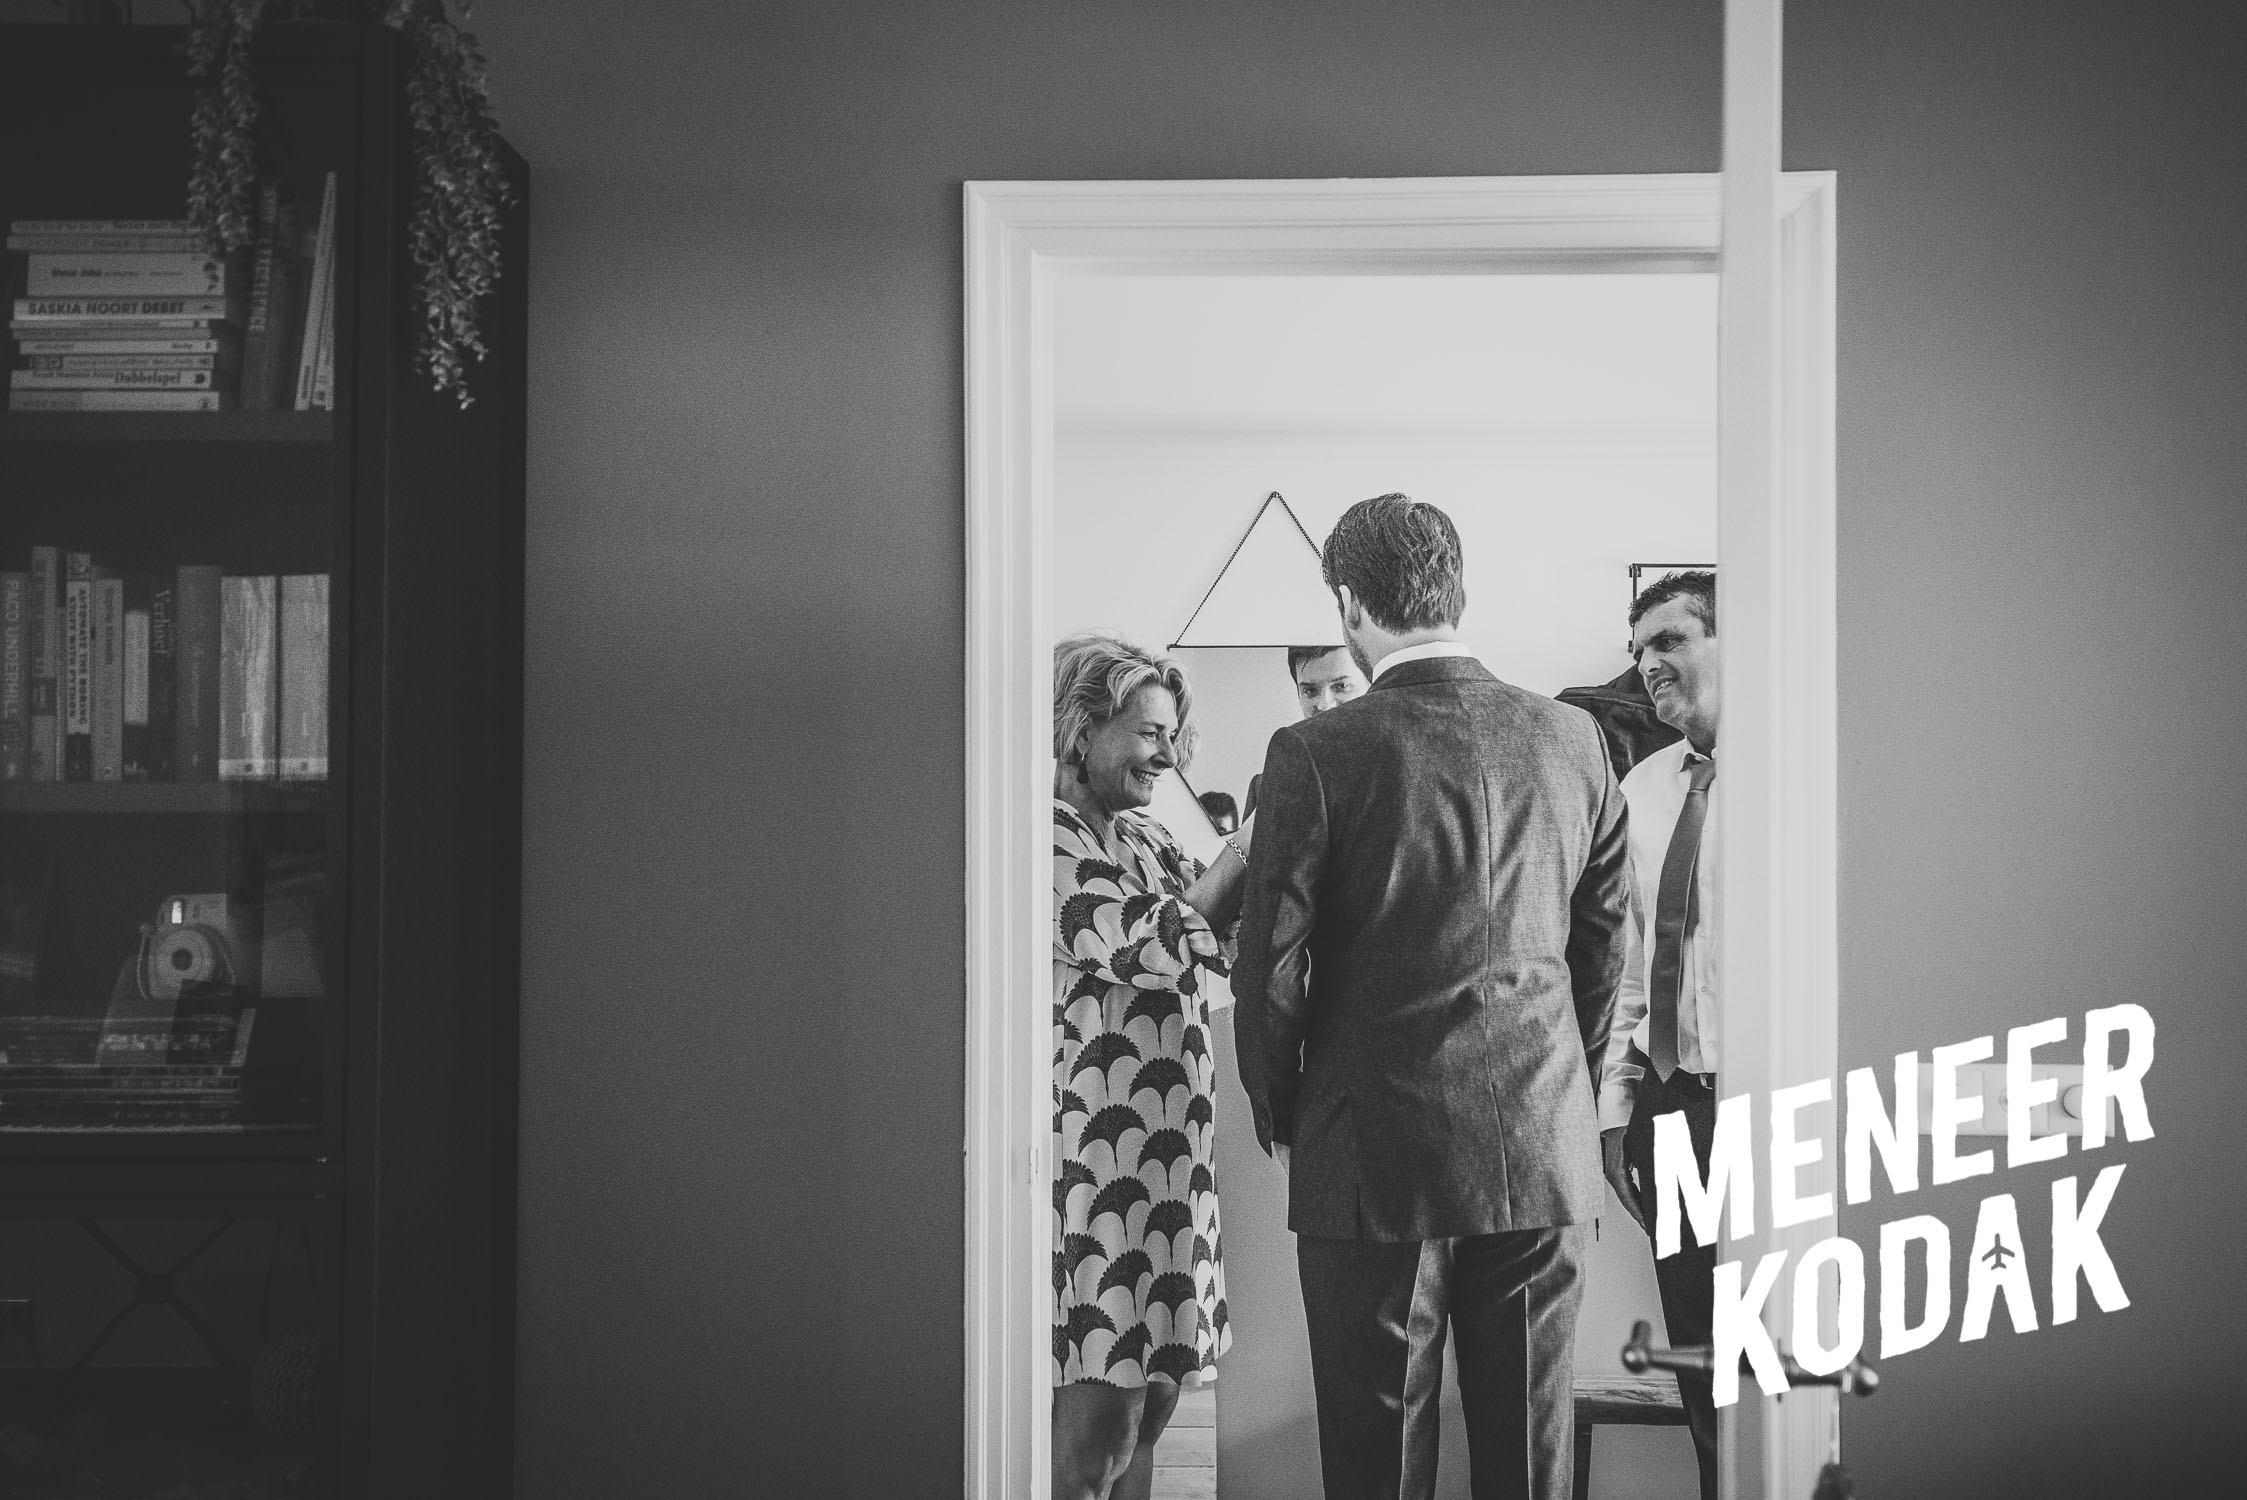 Meneer Kodak - Trouwreportage - Breda - E&M-062.jpg